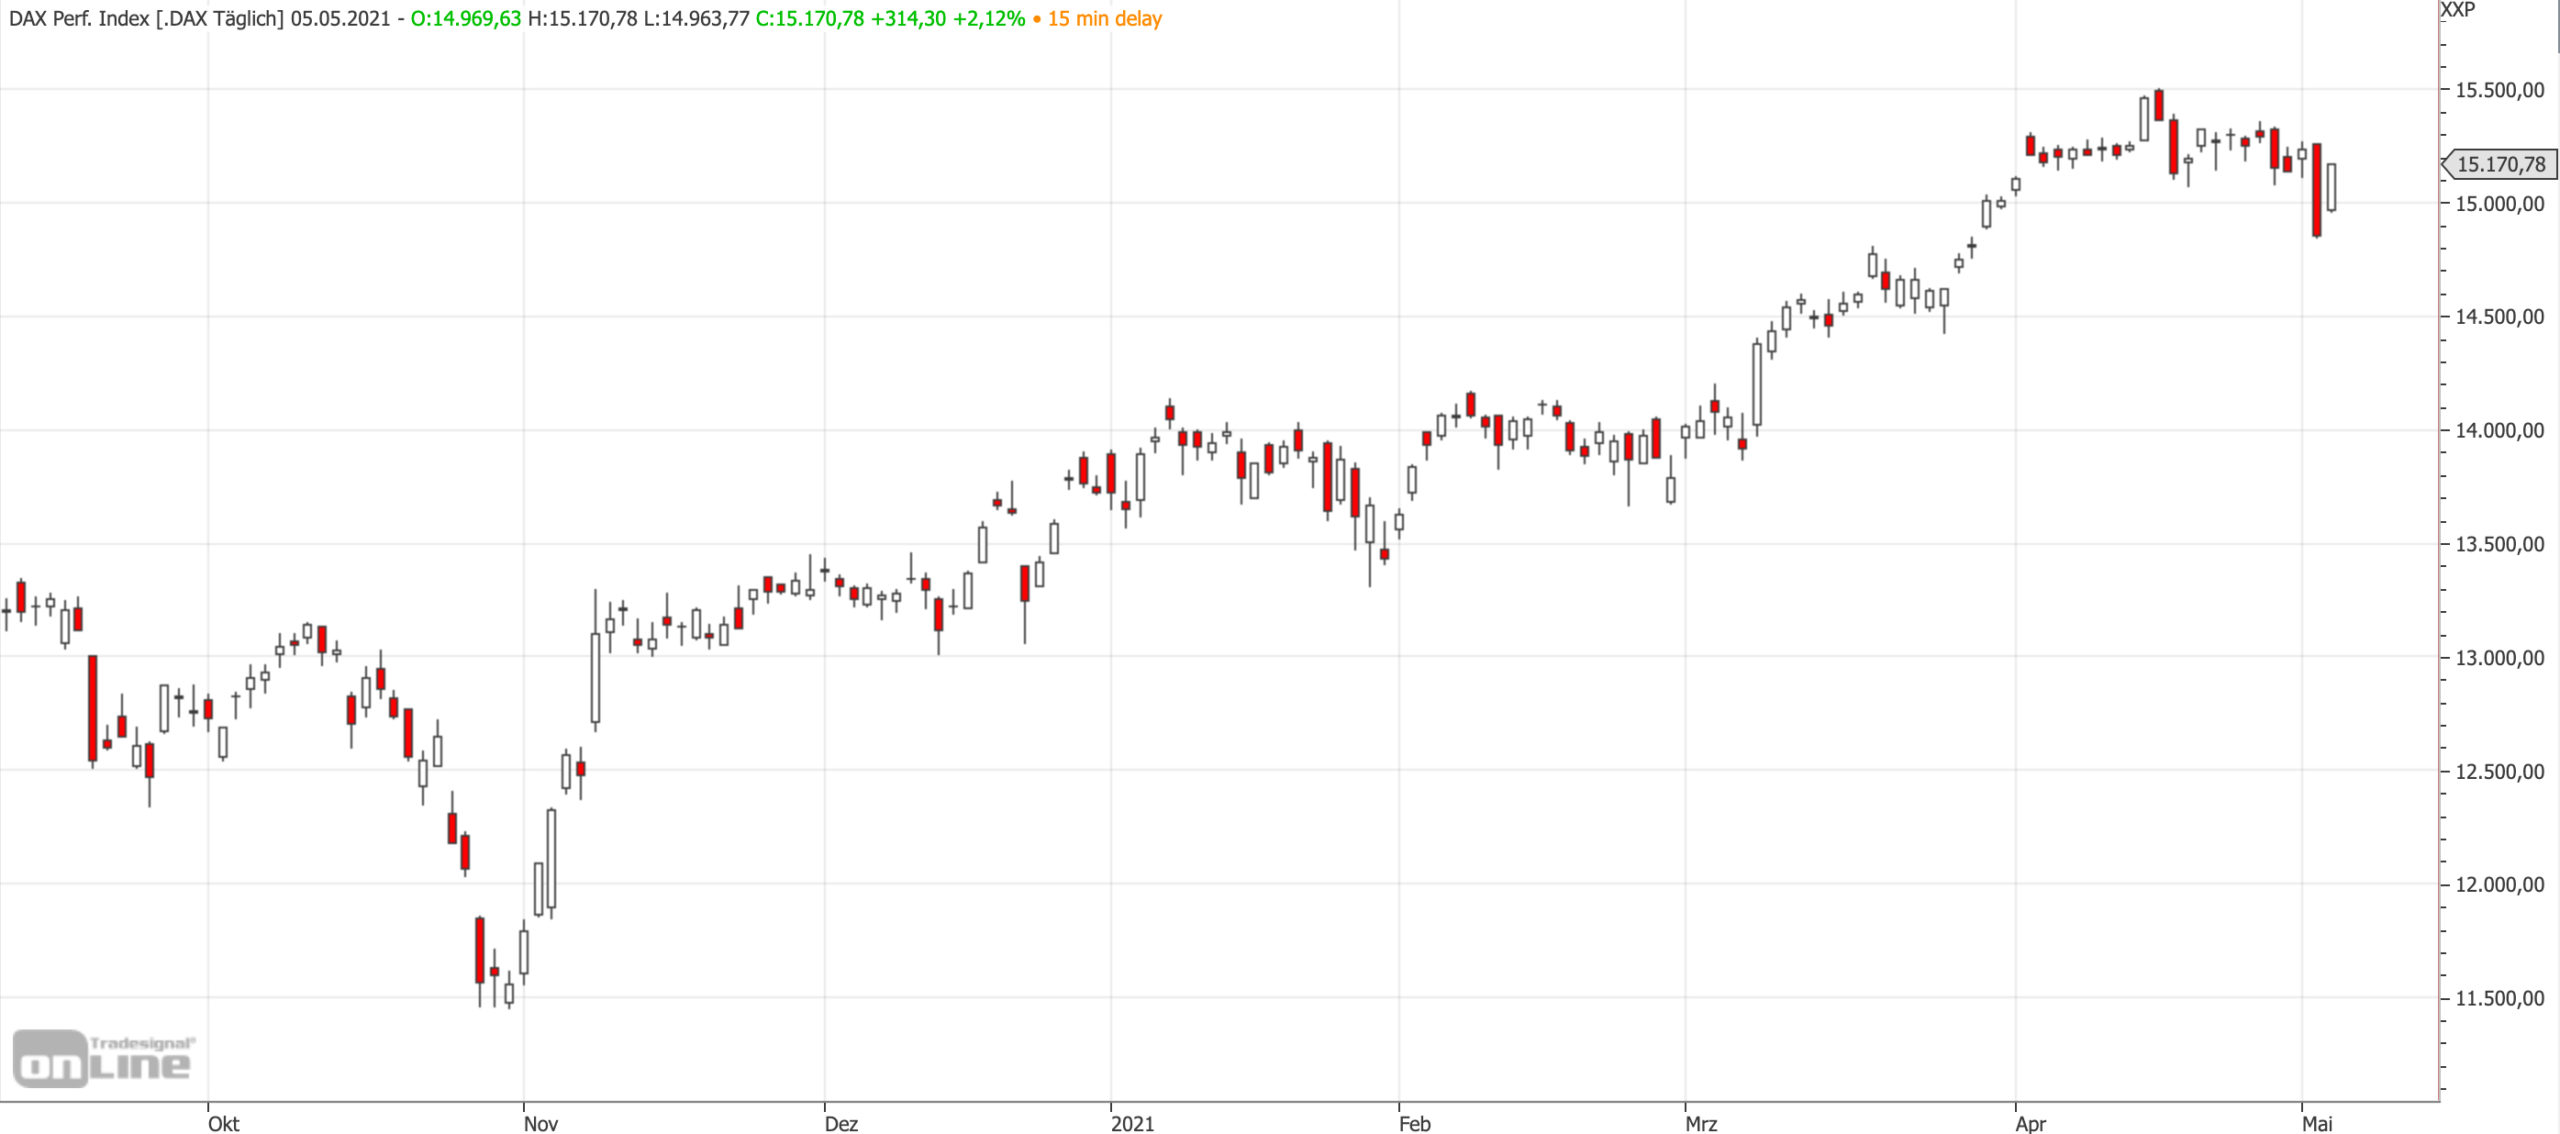 Mittelfristiger DAX-Chart am 05.05.2021